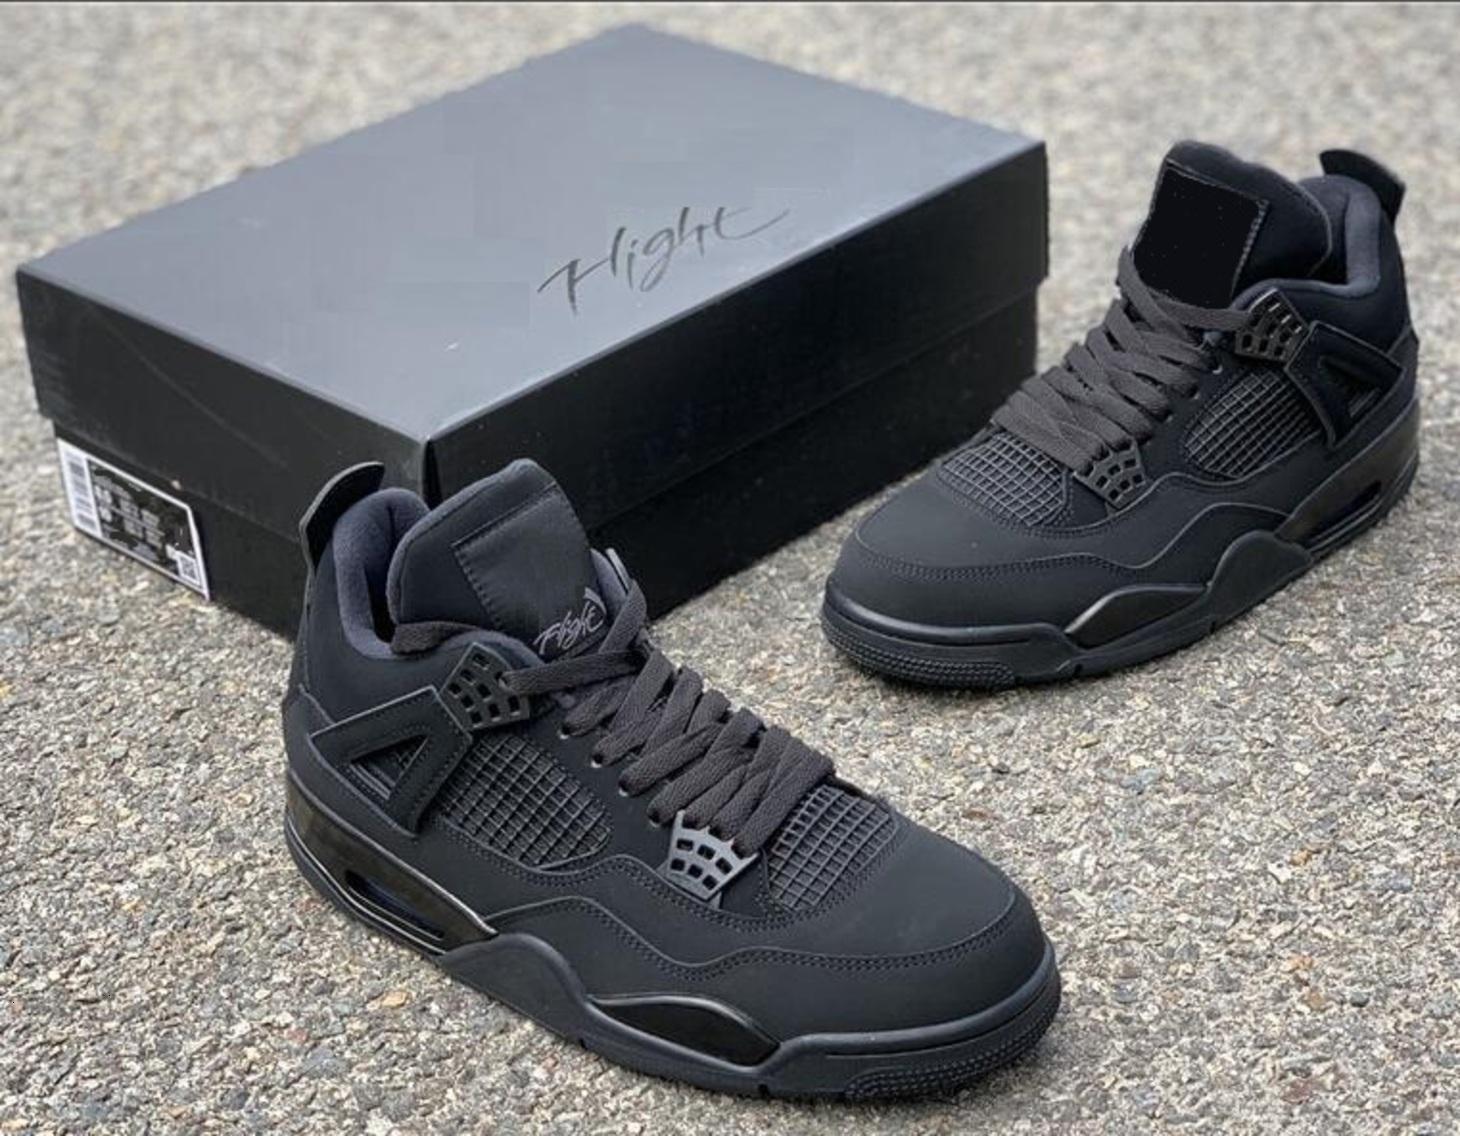 4 Black Cat 4s High Qaulity Version SE Neon 4S UNC MEN Basketballschuhe mit Kastengröße 40-47 Sneakers Sneaker